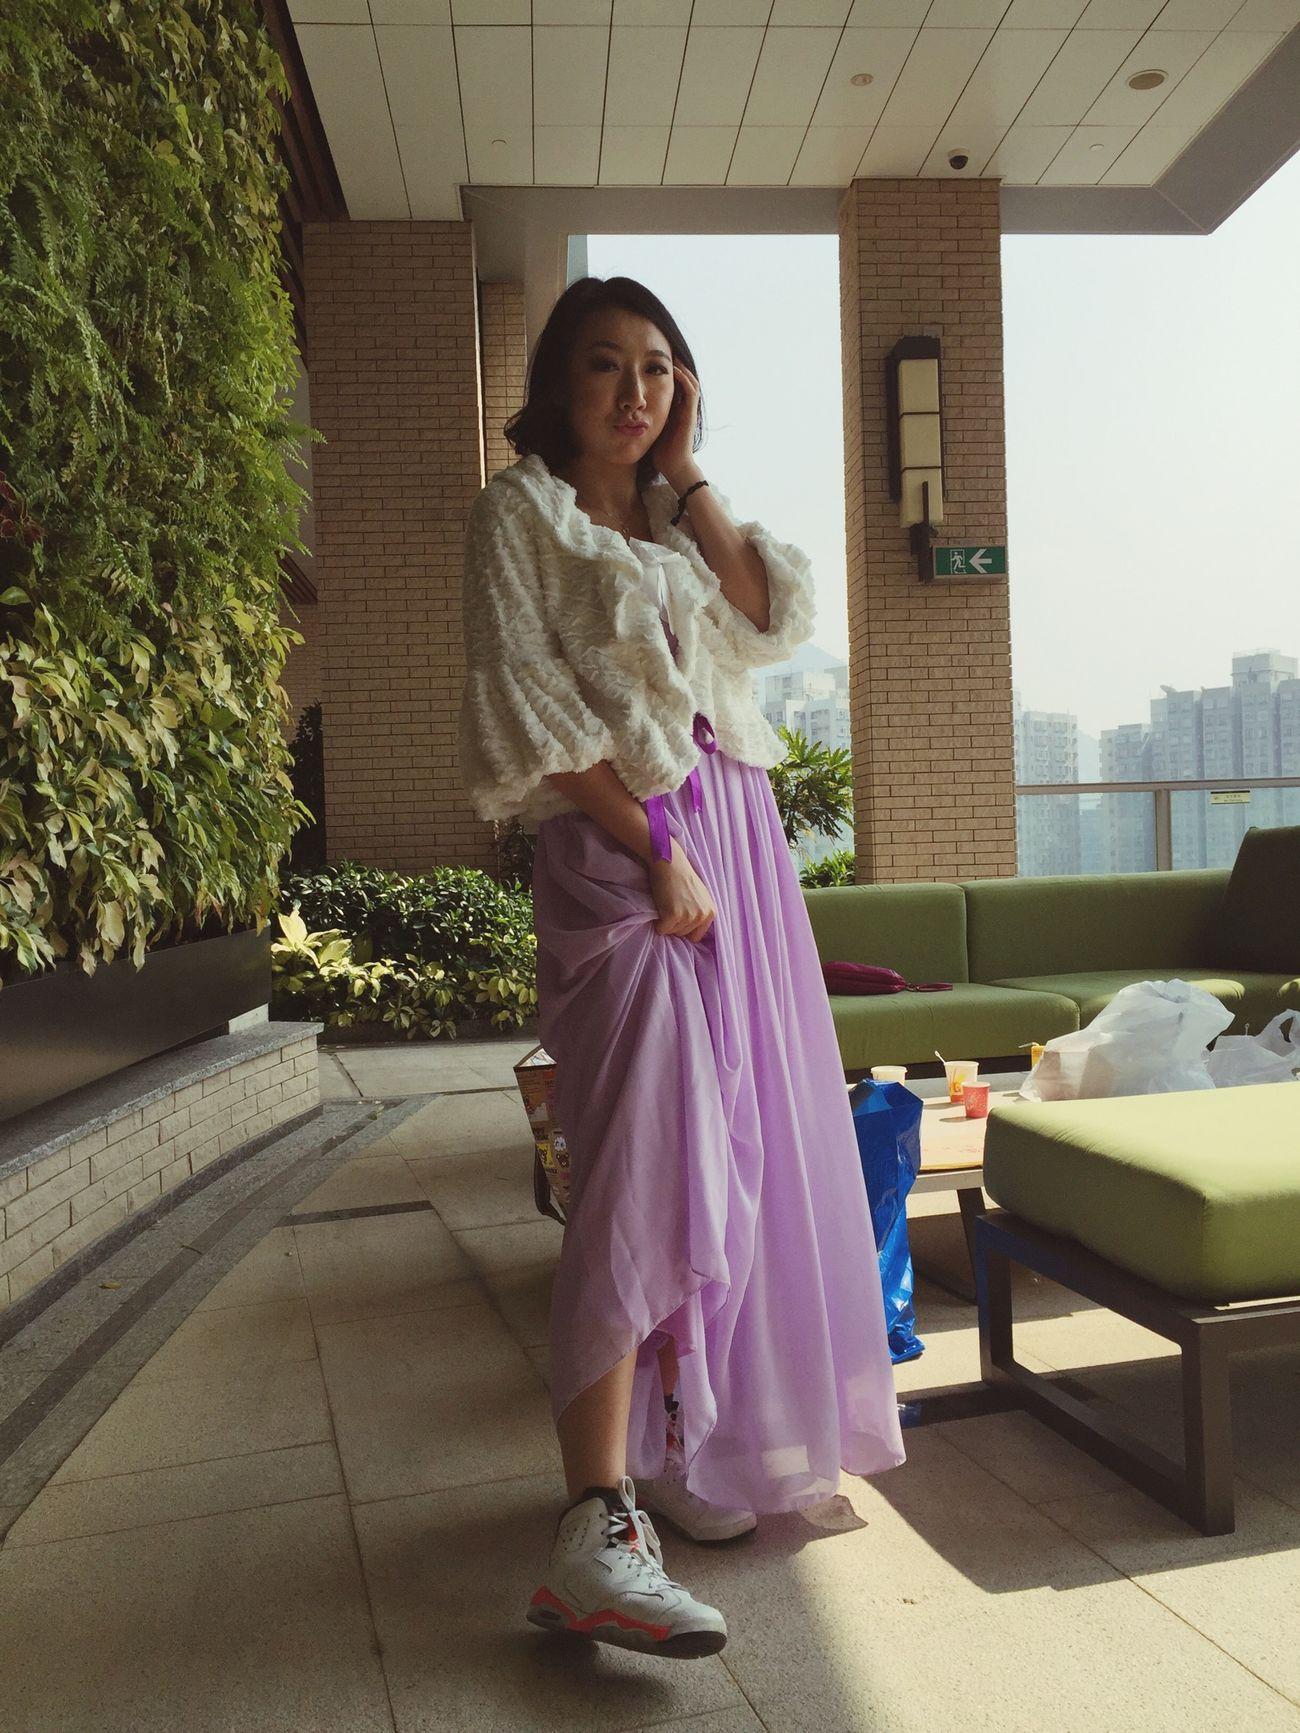 Jordan bridesmaid. Air Jordan Jordan Love Life Girl Jordan Girl Wedding Bridesmaid HongKong That's Me